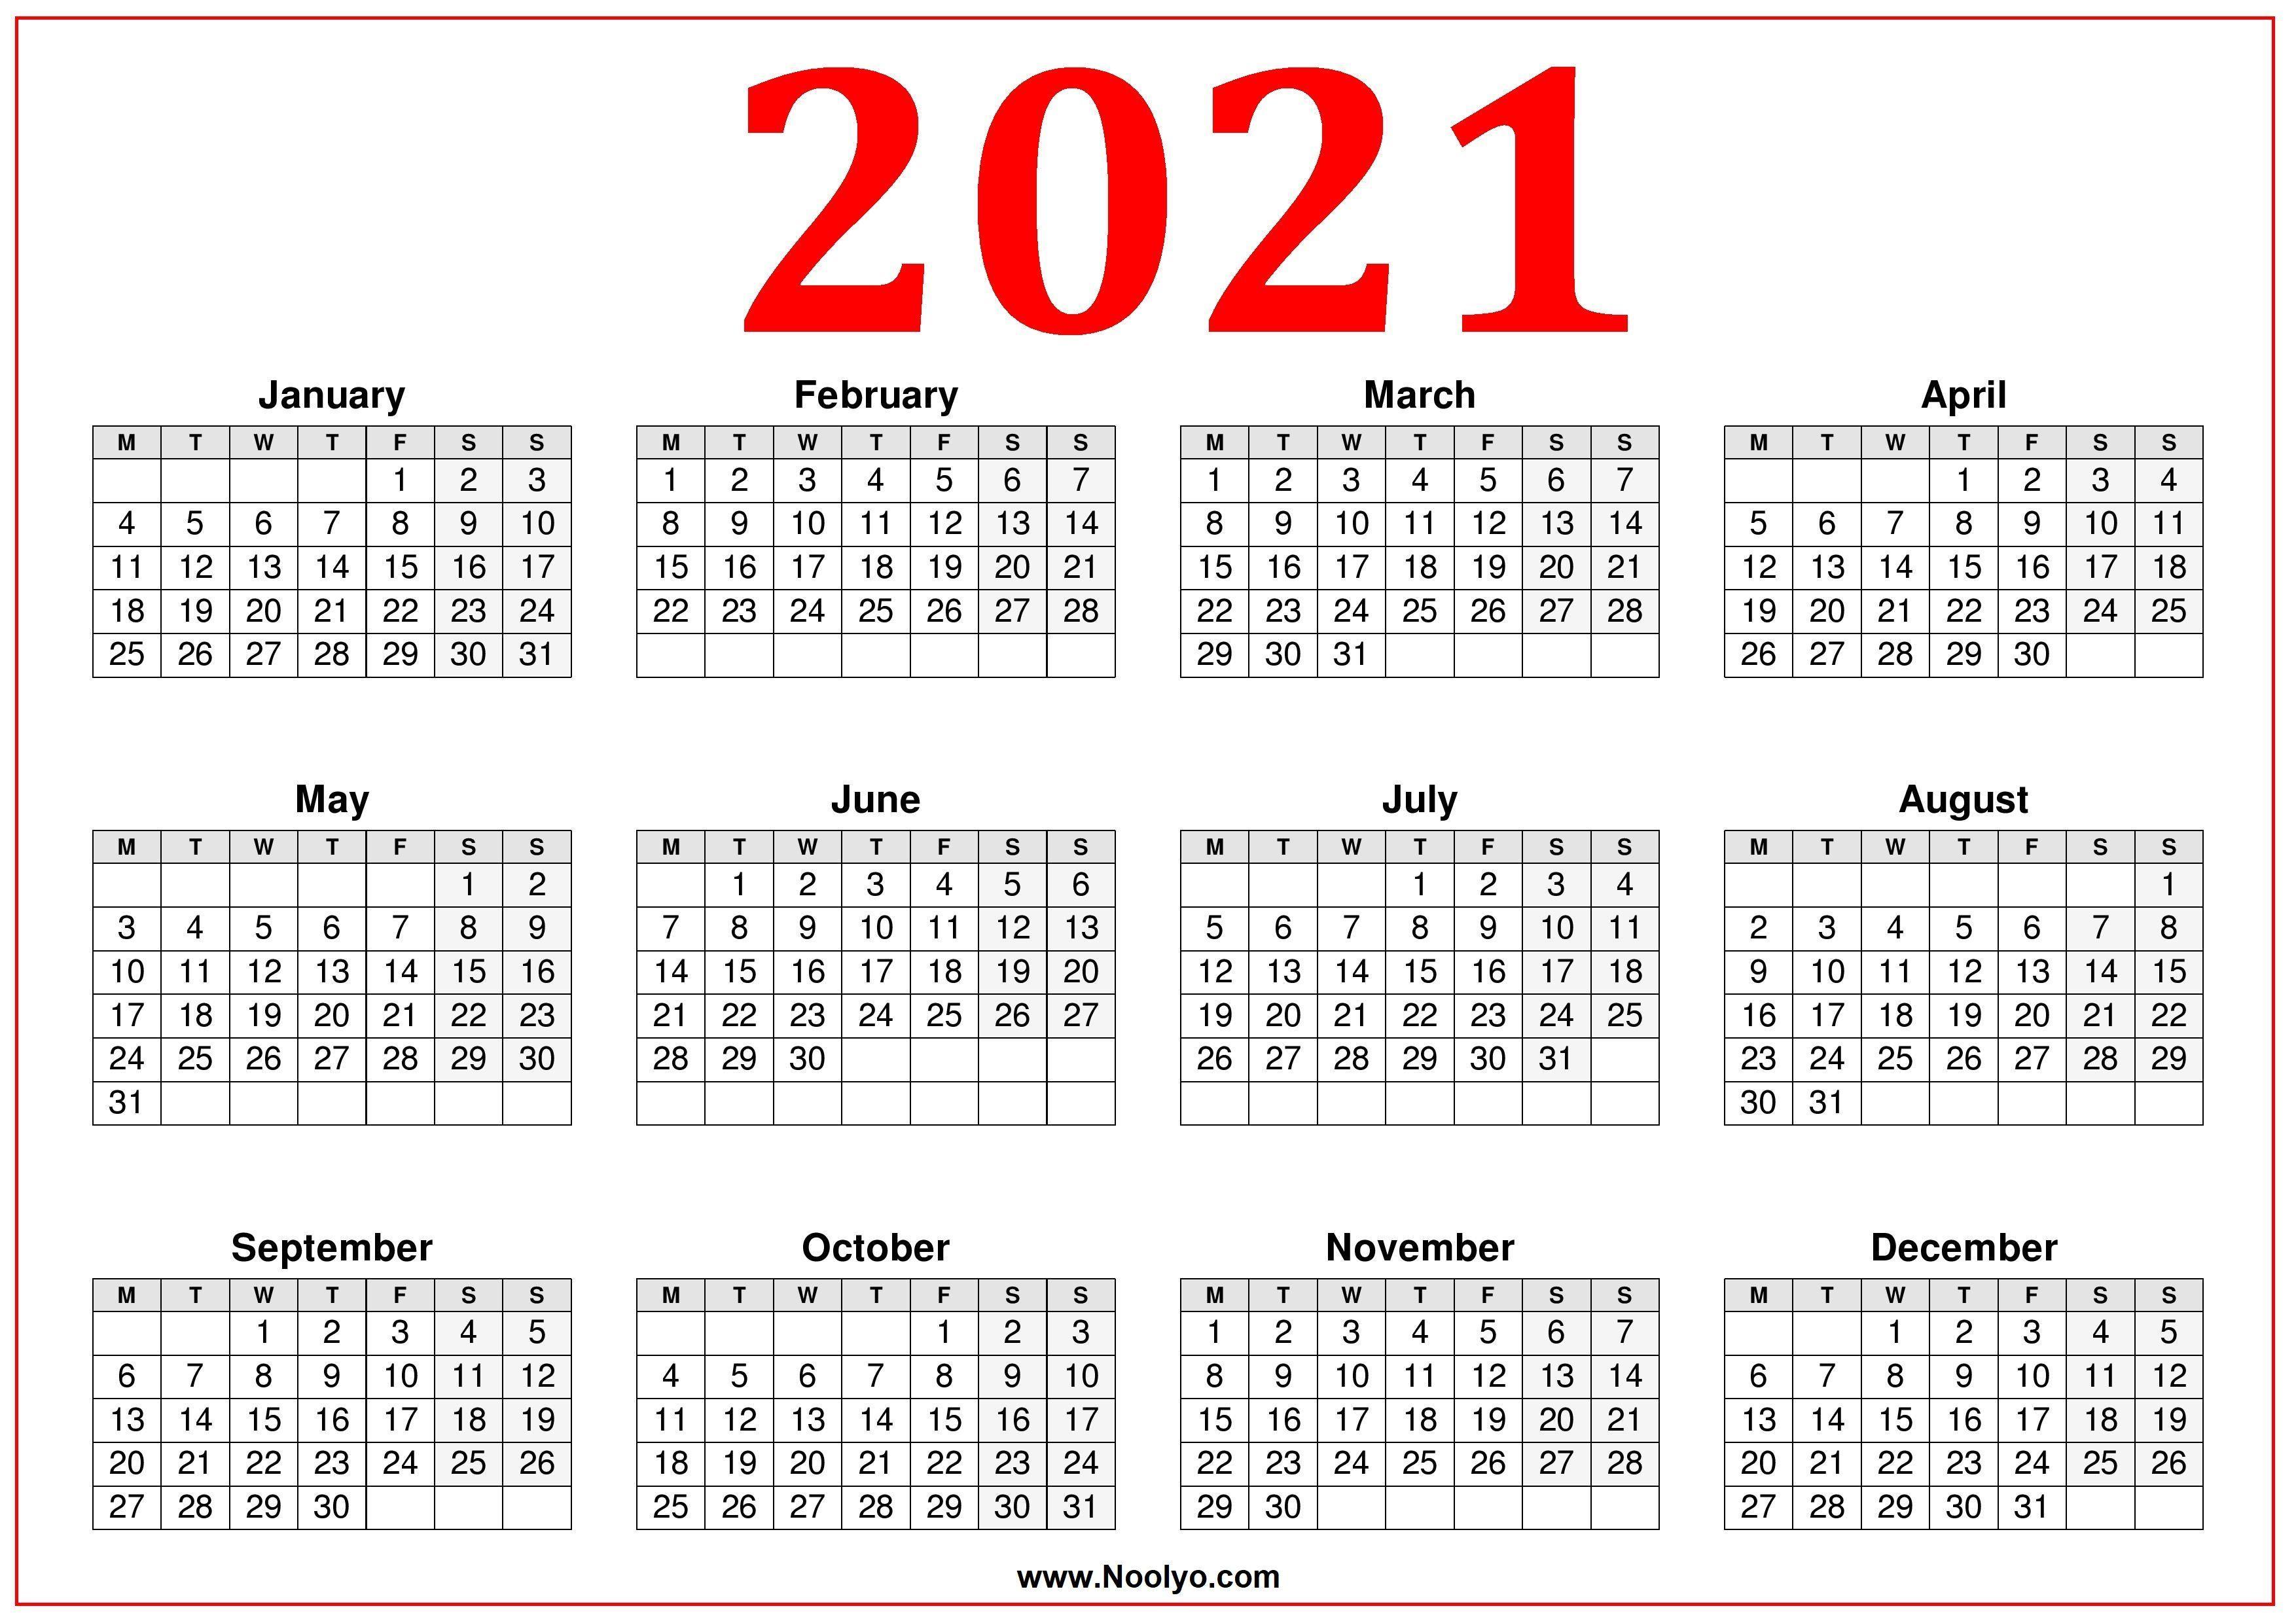 2021 Calendar Wallpapers - Top Free 2021 Calendar ...